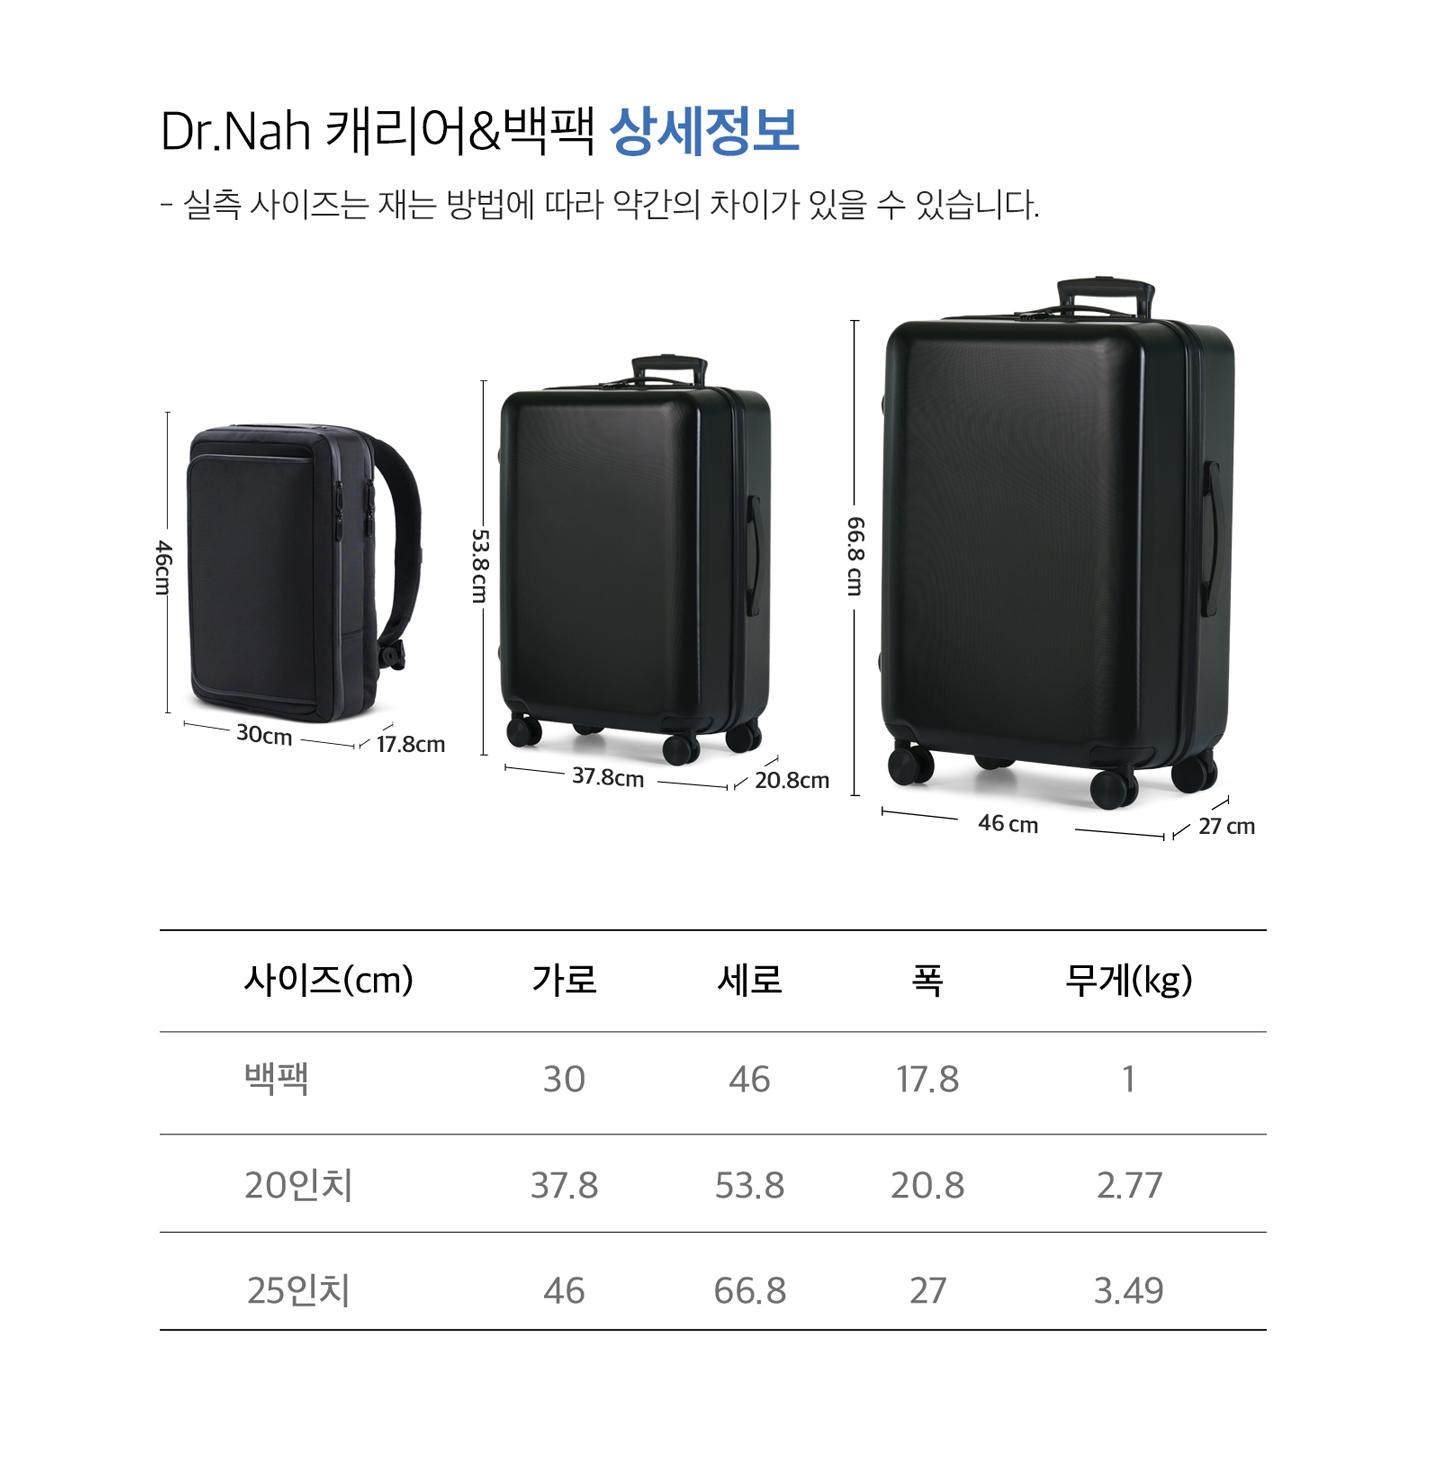 NEW샤플 Dr.Nah세트(캐리어20'/25'+백팩)1